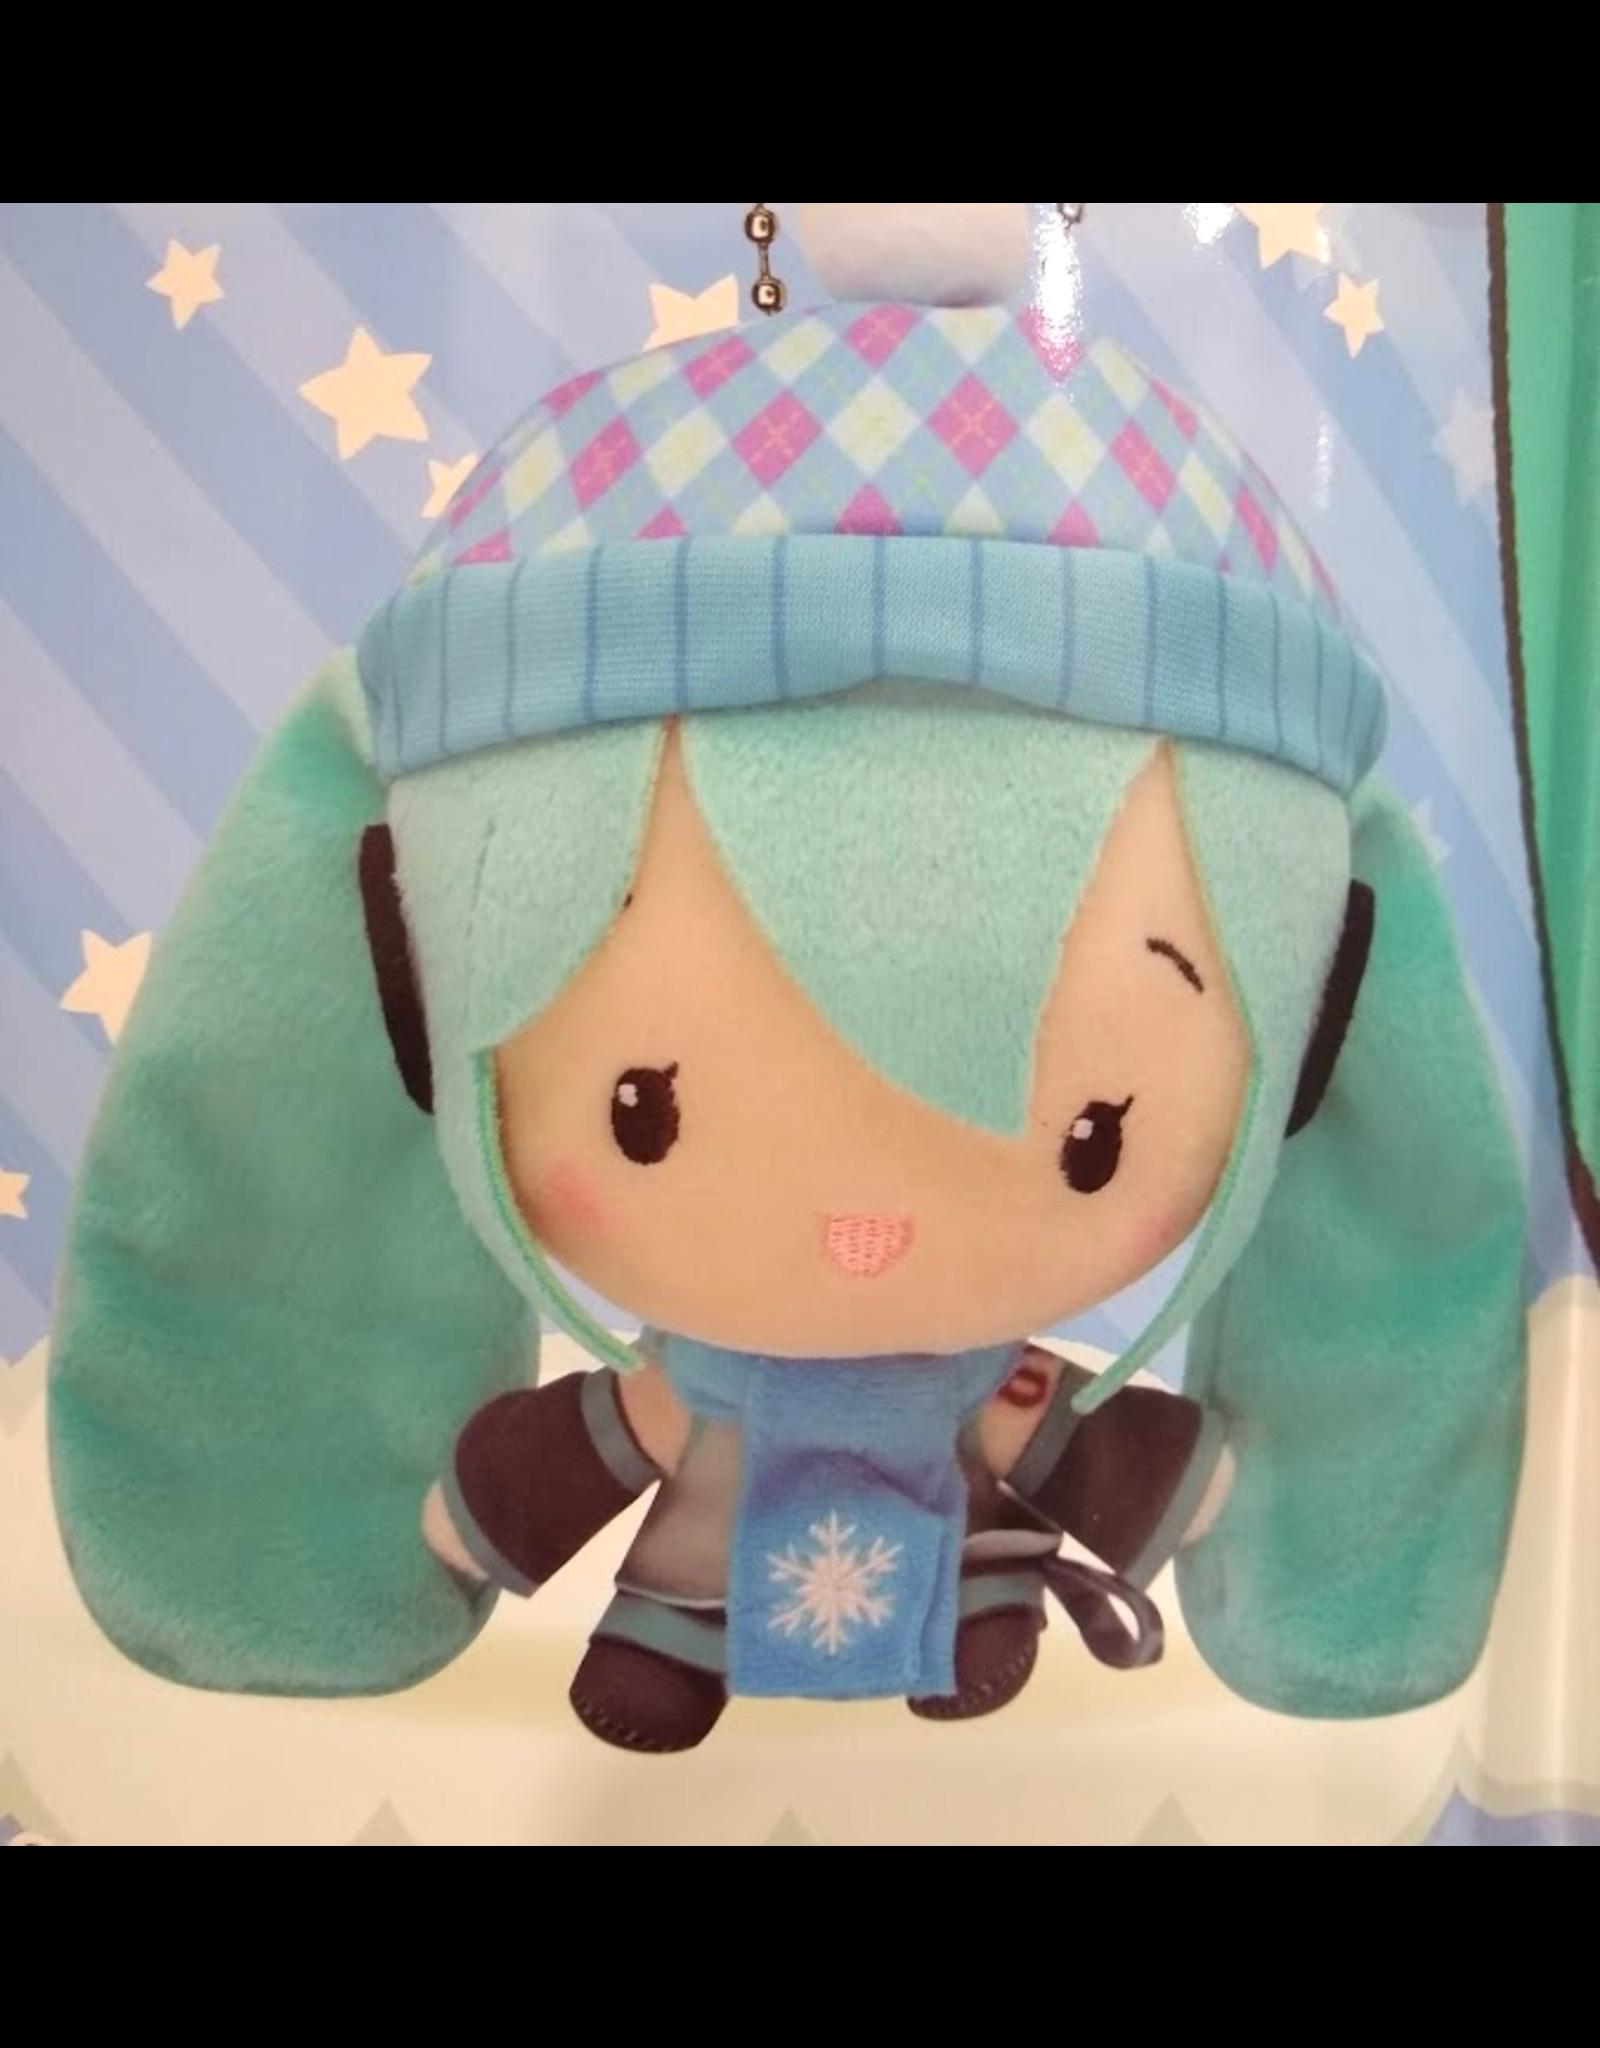 Hatsune Miku Cute Plush Winter Version - Chequered Beanie - 14 cm